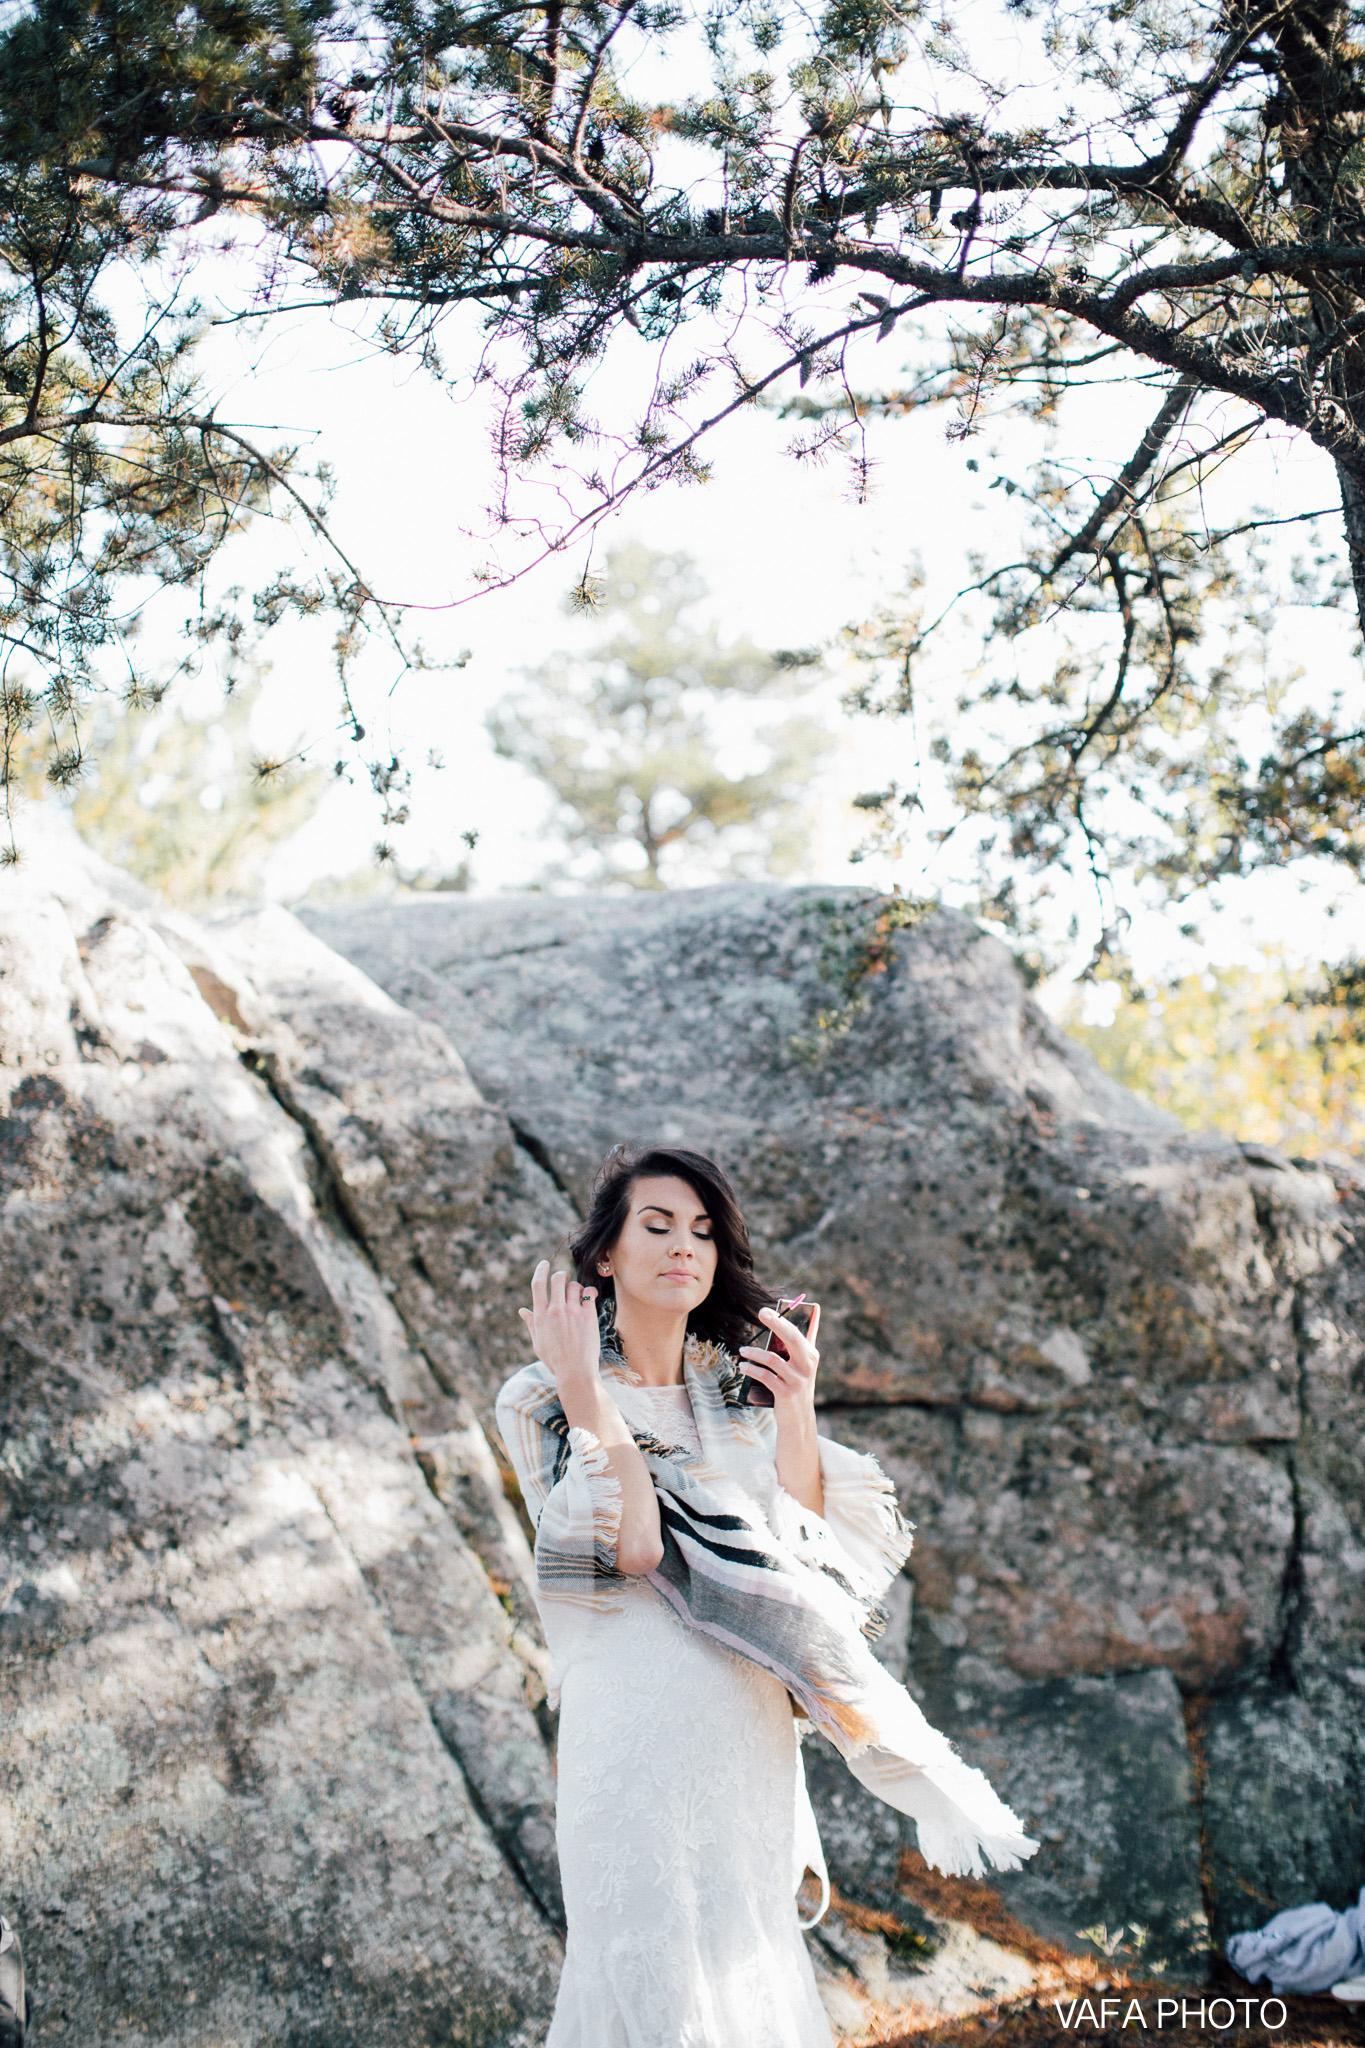 Hogback-Mountain-Wedding-Chelsea-Josh-Vafa-Photo-103.jpg